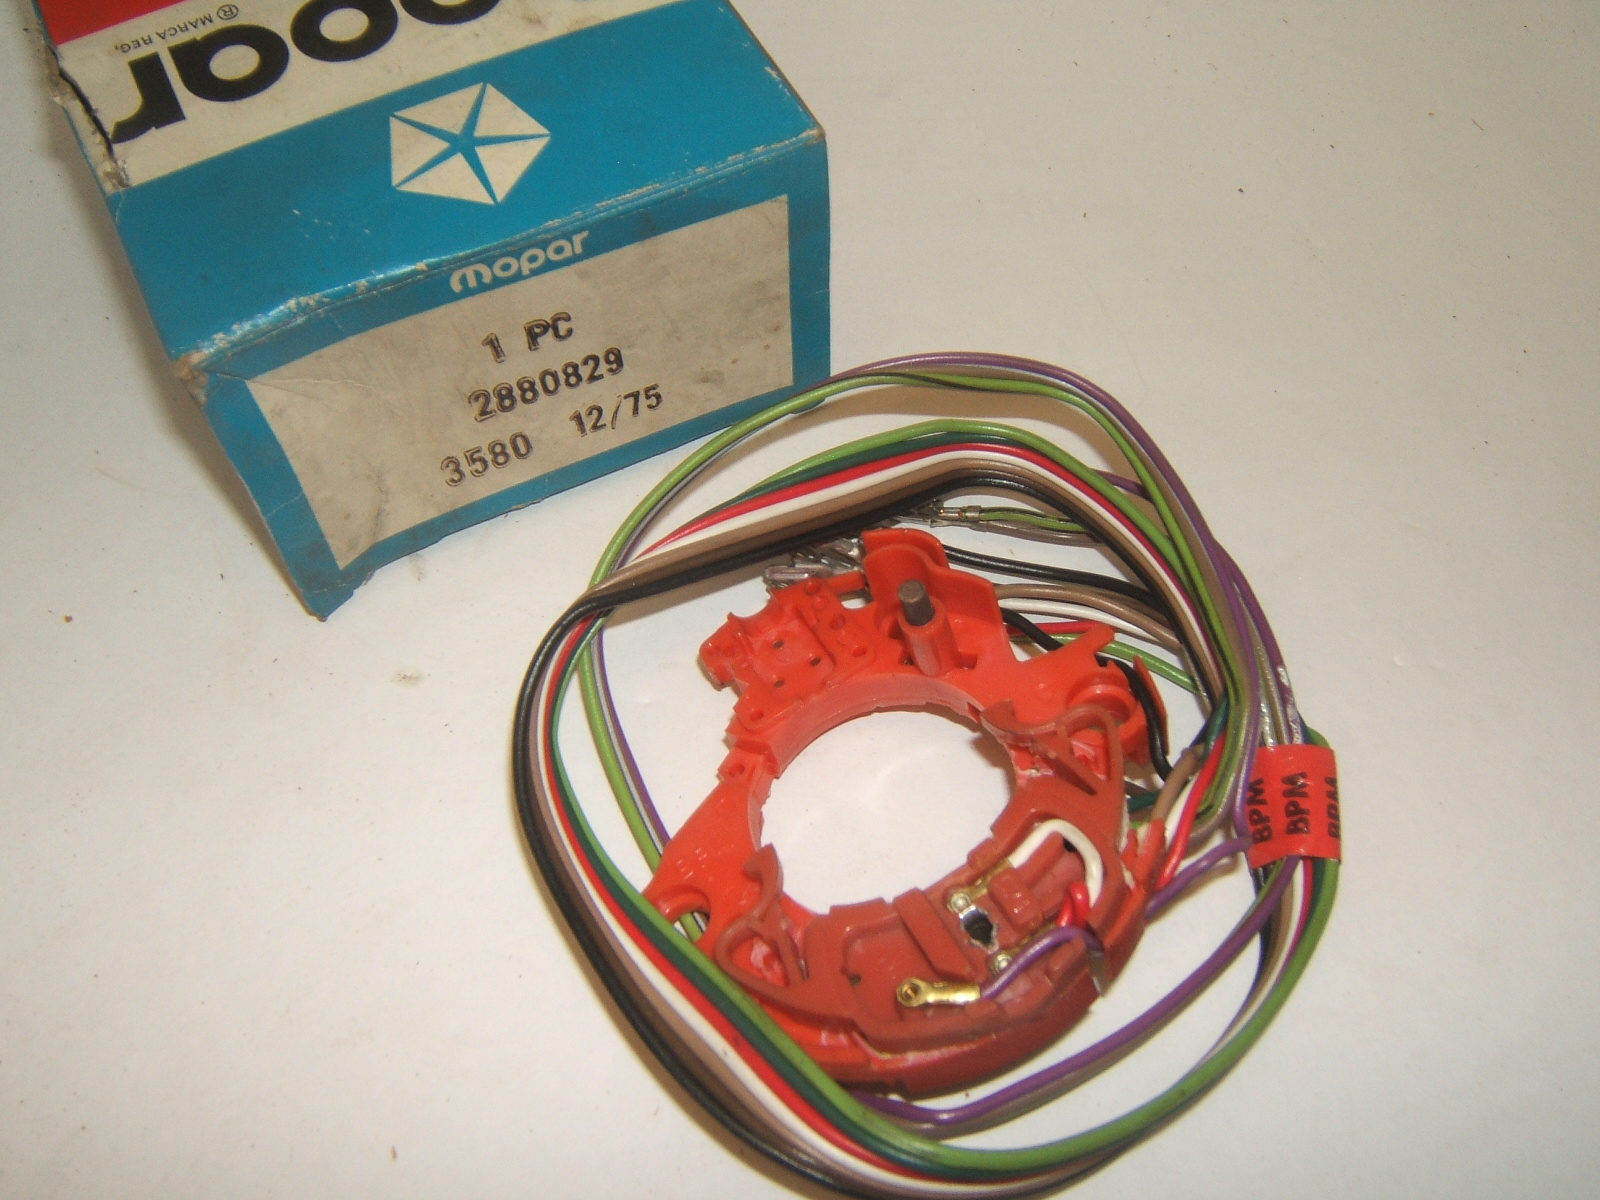 1967 68 69 Chrysler Plymouth Fury Dodge Polara Turn Signal Switch NOS 2880829 (a 2880829)